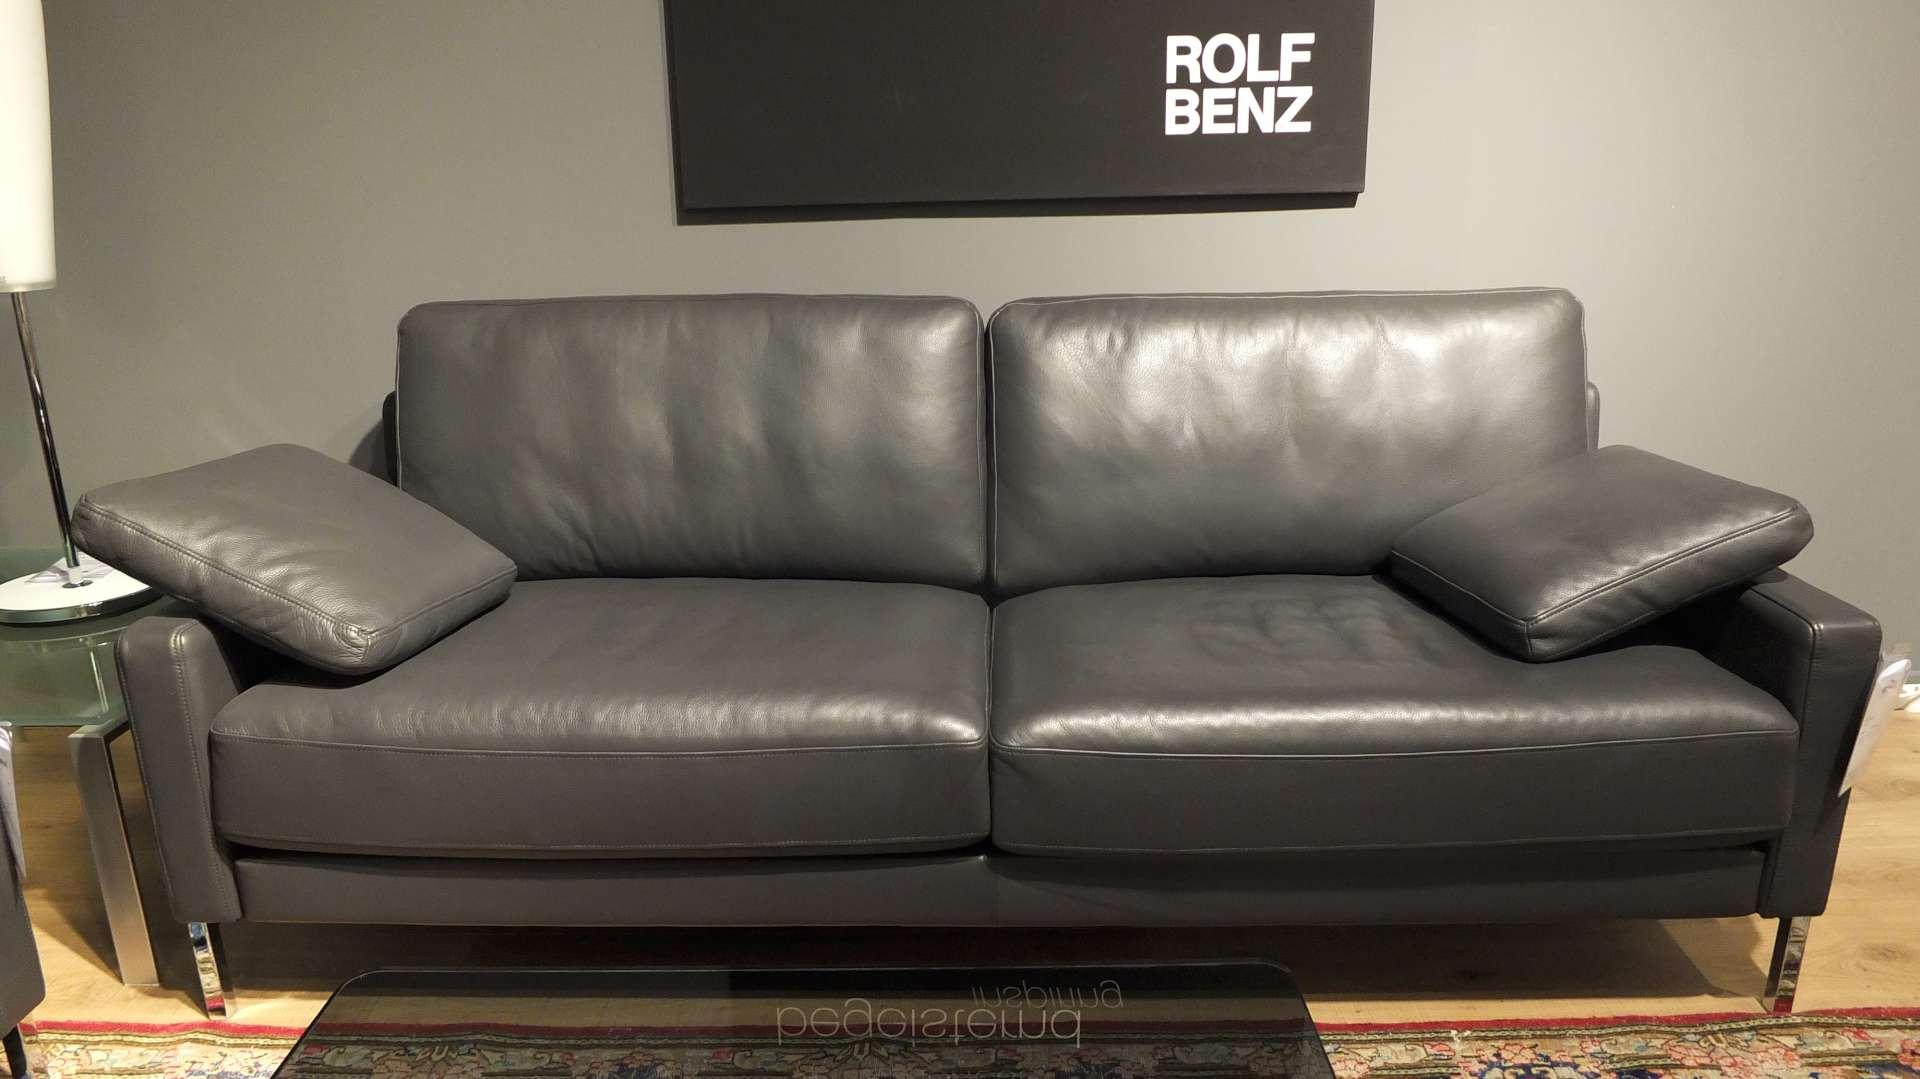 Full Size of Rolf Benz Sofa Couch Gebraucht List Kosten Dono Furniture Usa Leather Freistil 183 Preis Sessel Outlet Ego F Ebay Grünes Günstig Mit Abnehmbaren Bezug Sofa Rolf Benz Sofa